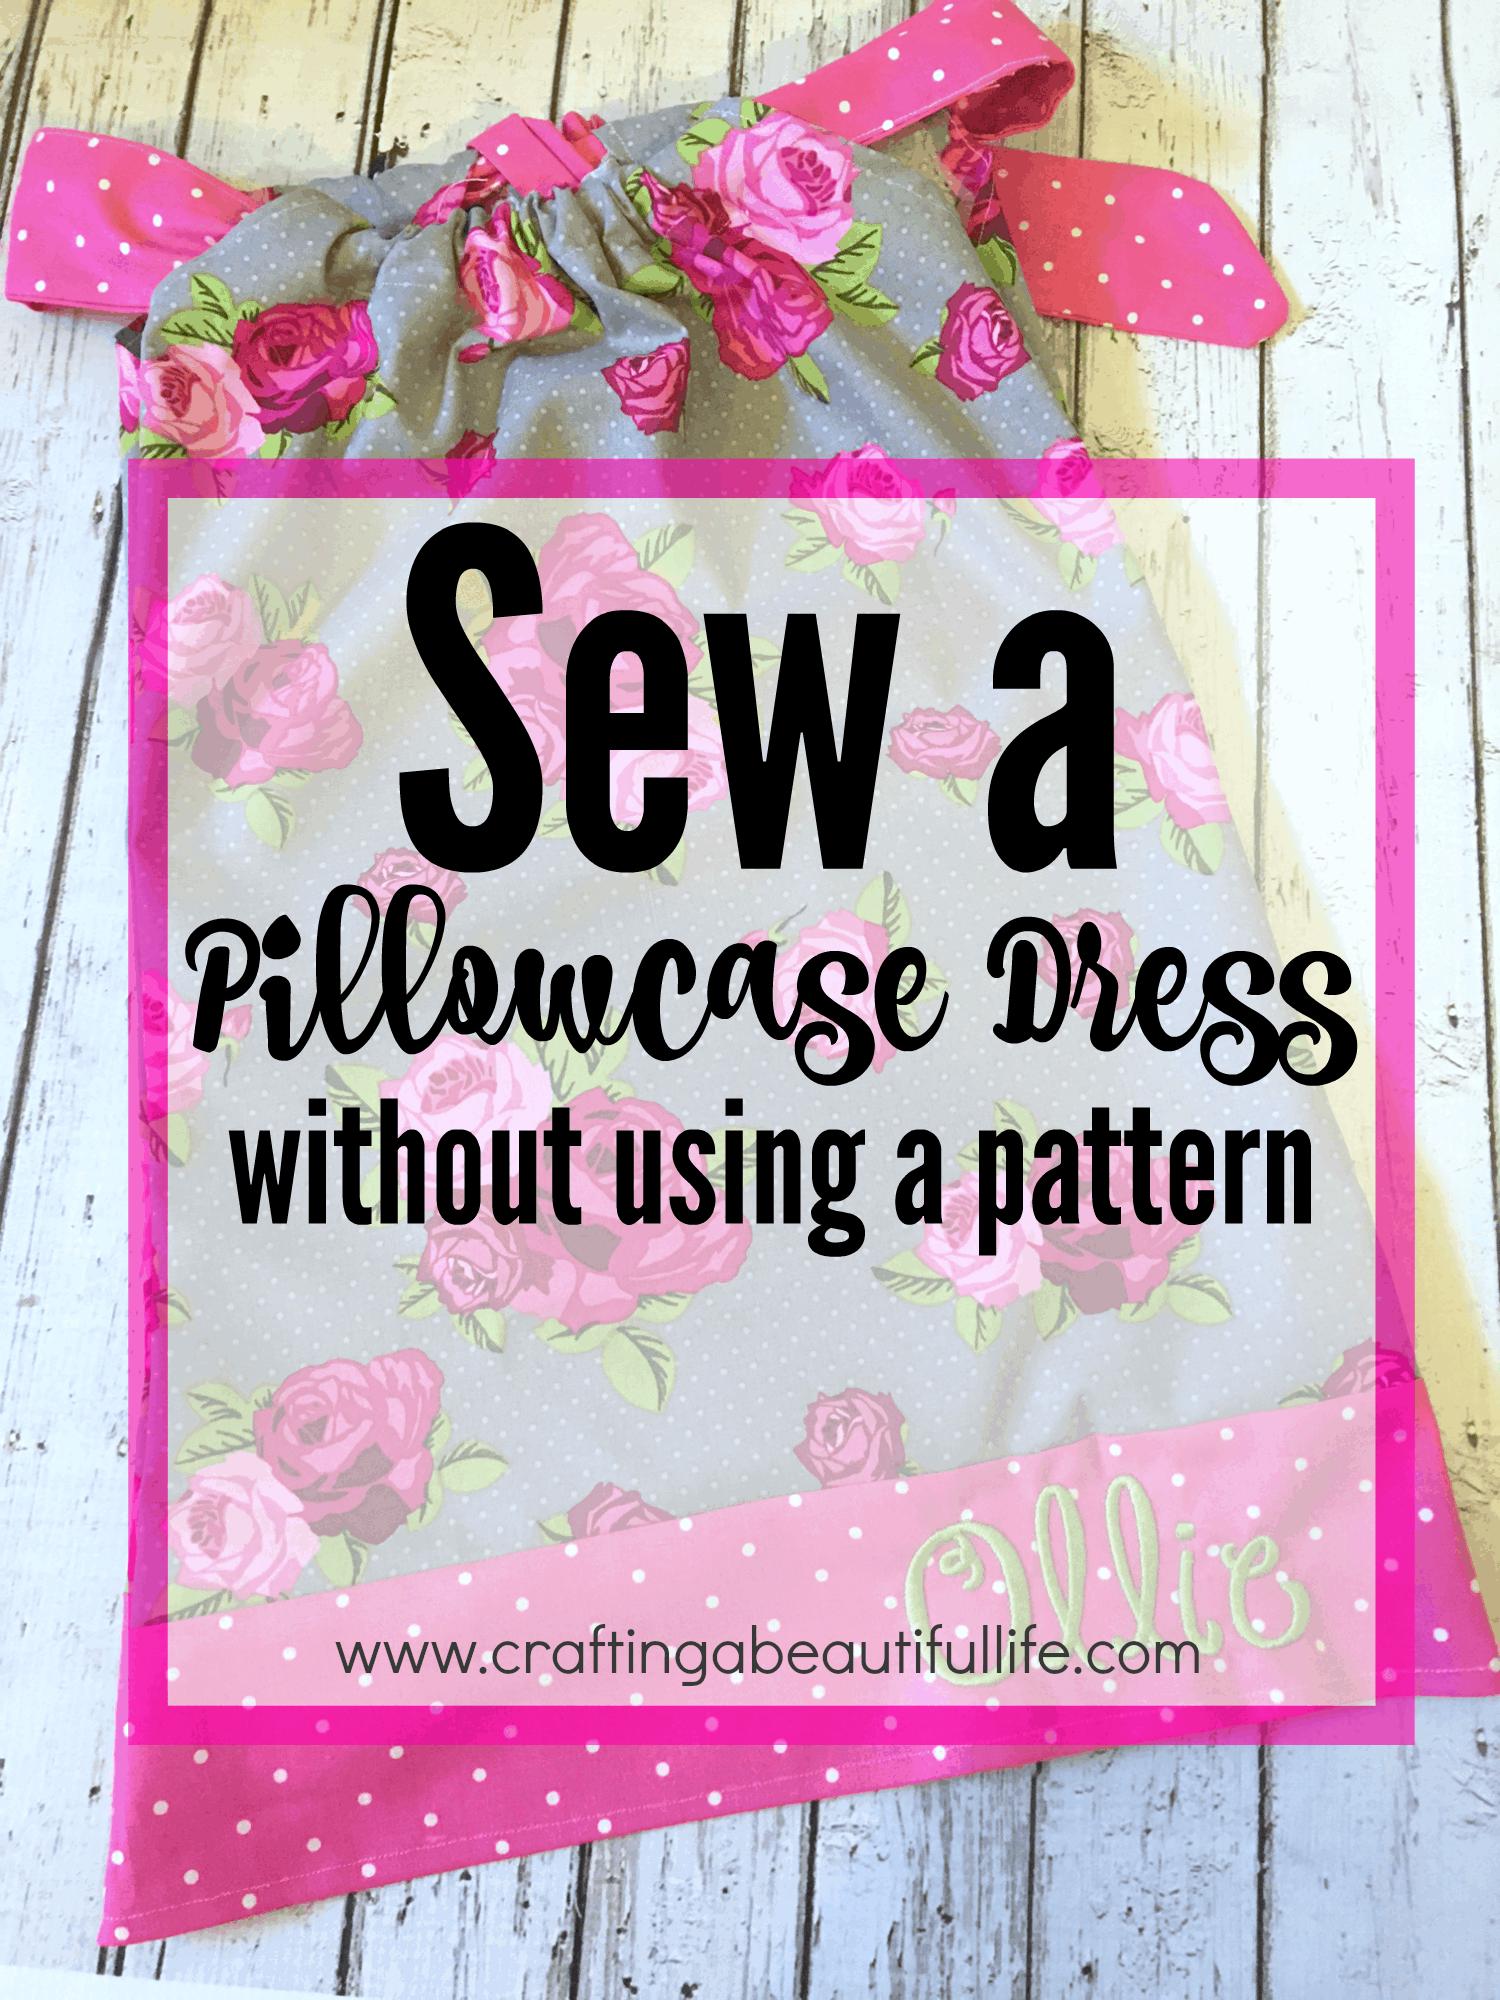 Kids' pillowcase dress